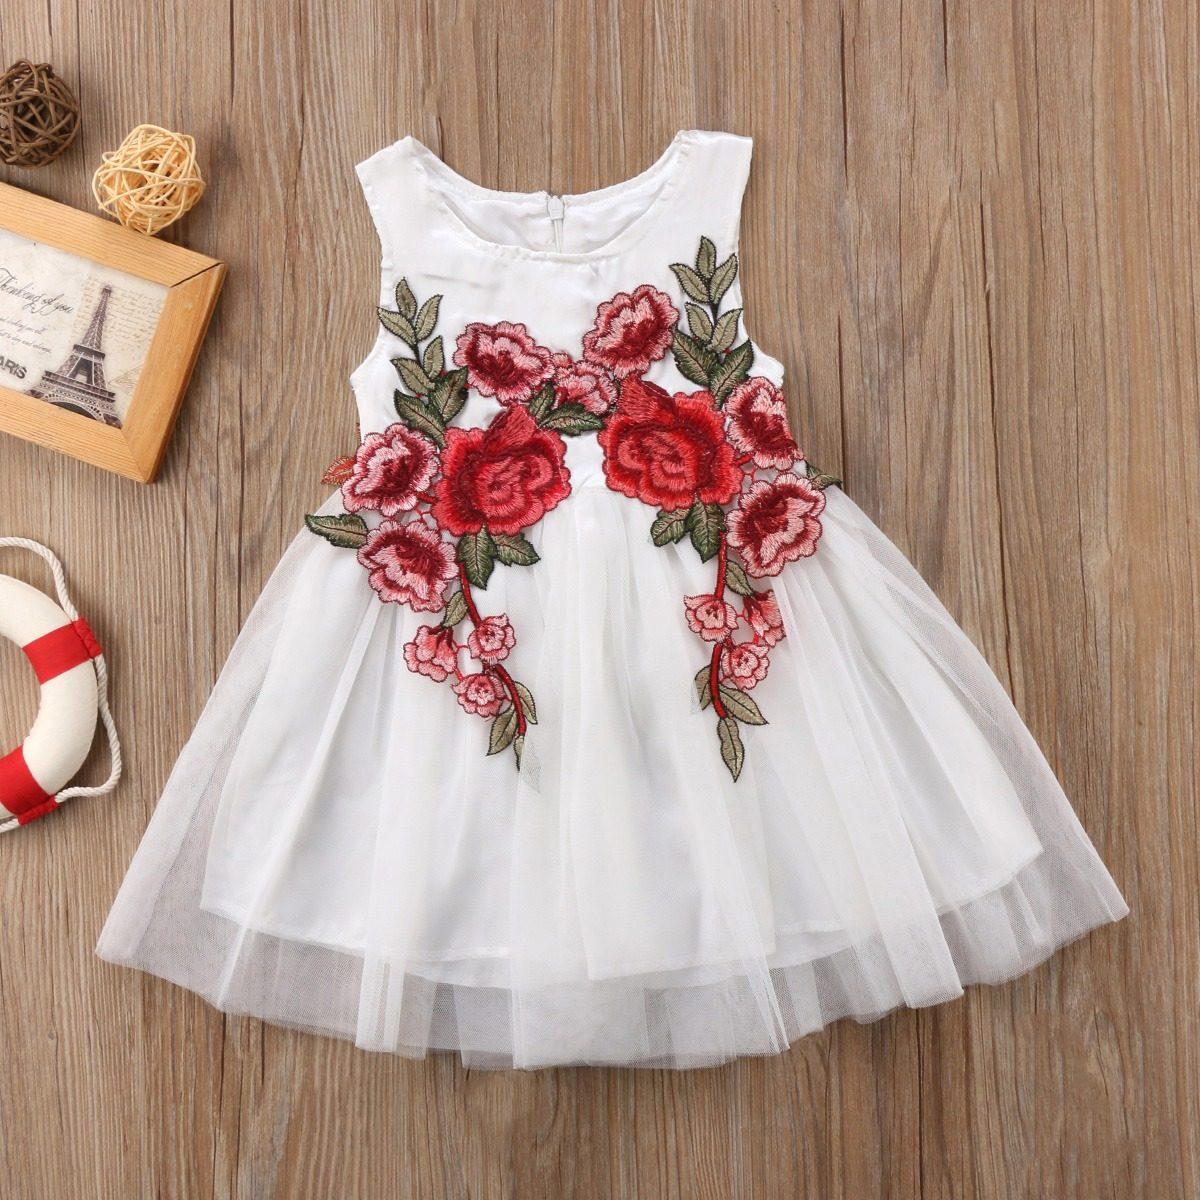 936a6f88f oferta vestido para niña de fiesta tono perla bordado rosas. Cargando zoom.